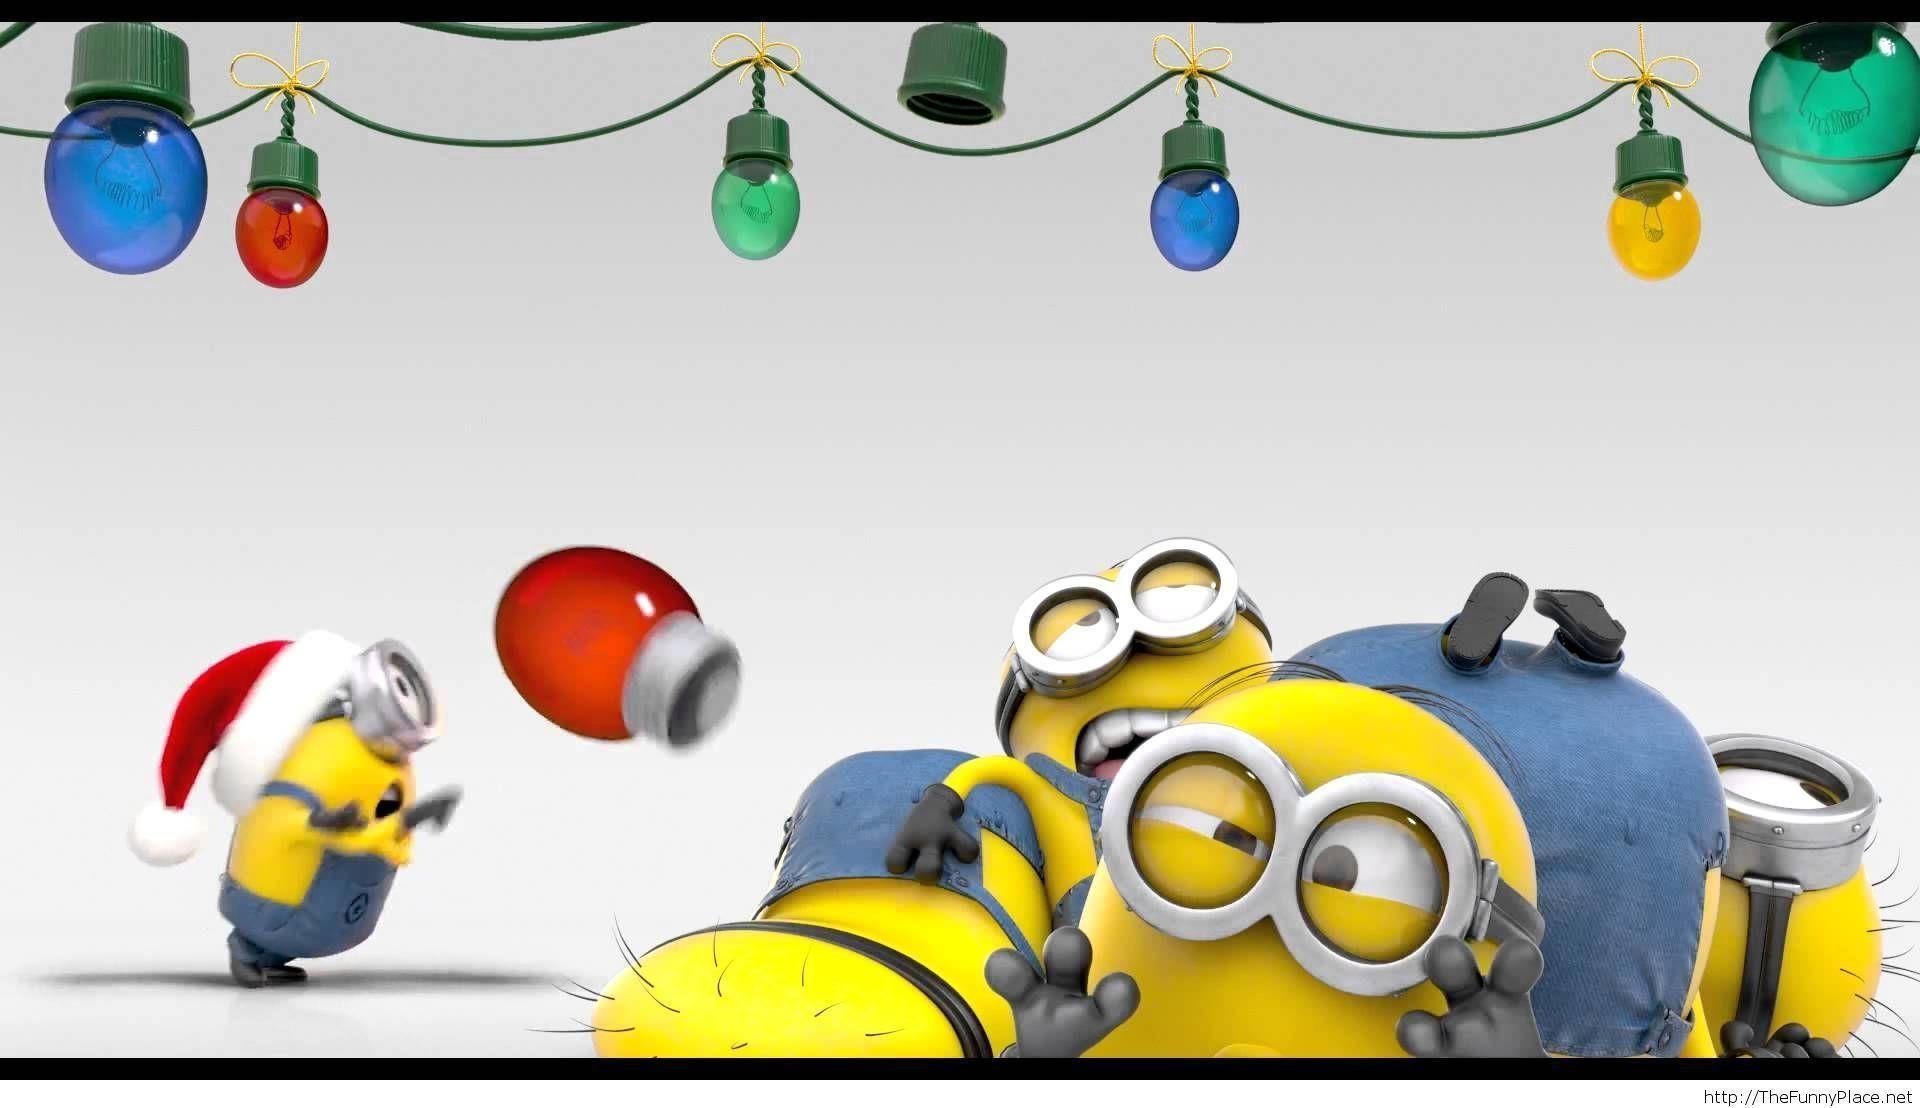 Res: 1920x1108, Funny Christmas Wallpaper